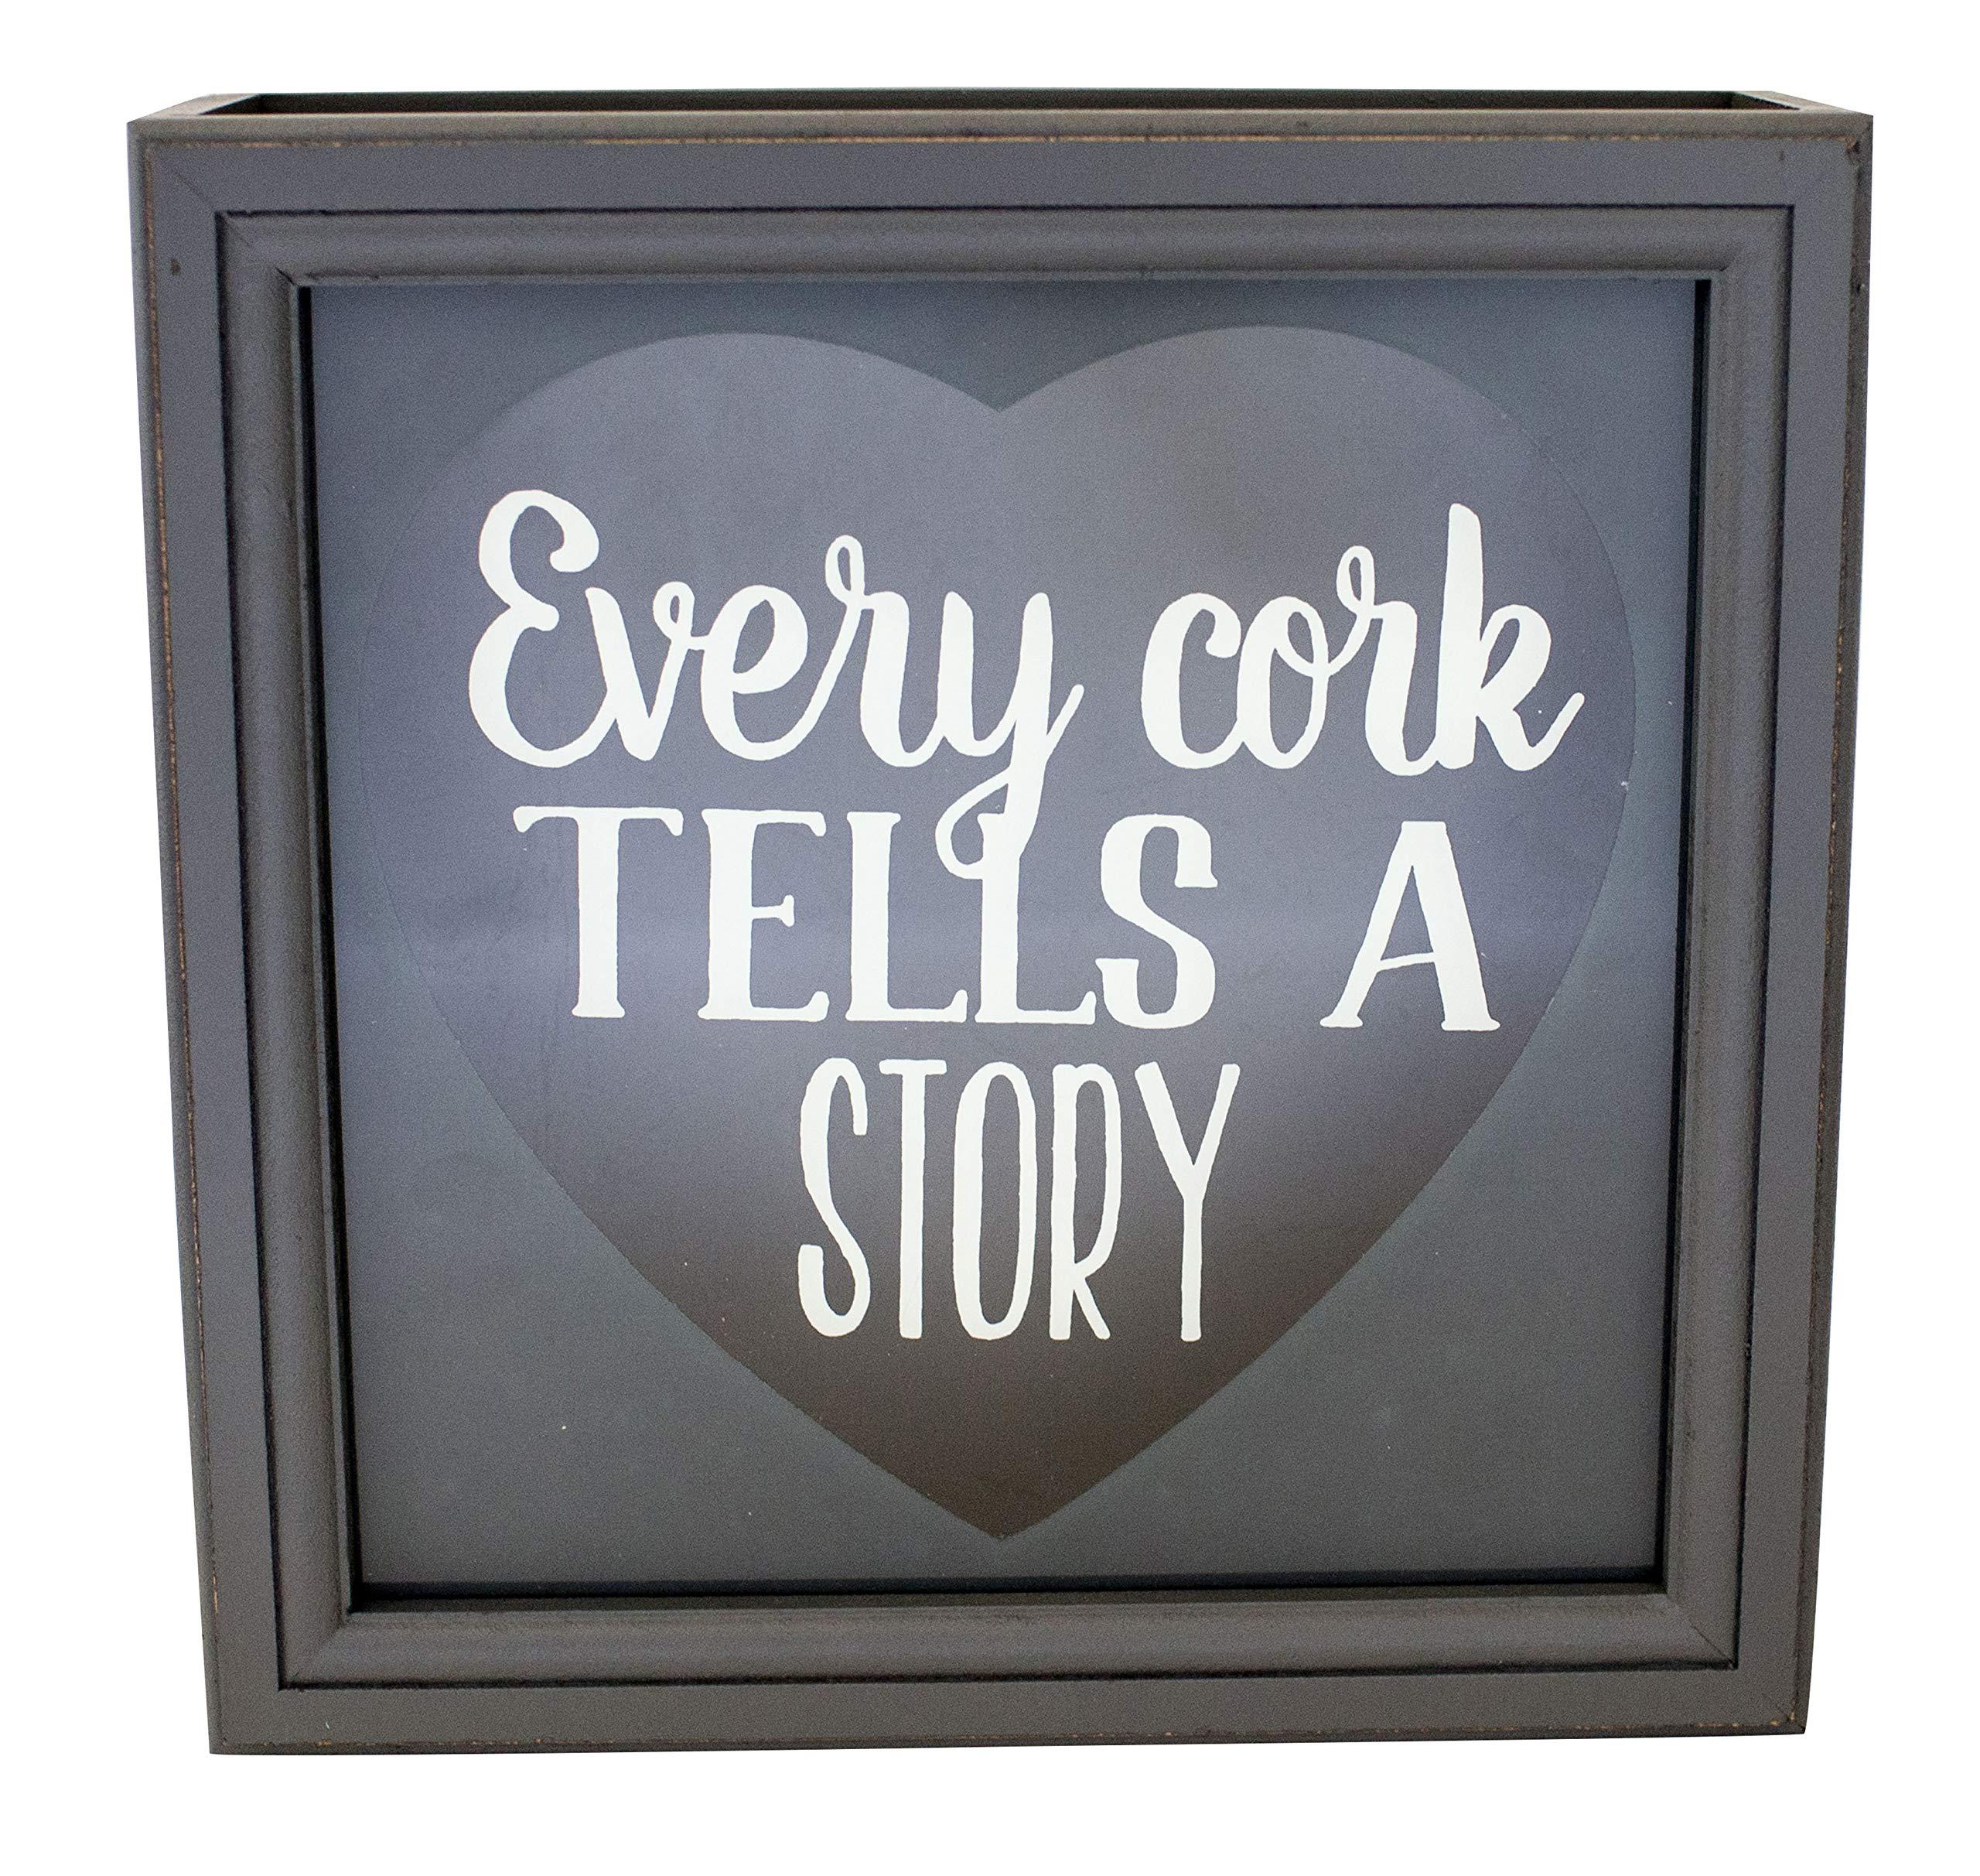 Shadowbox Wine Cork Holder Every Cork Tells A Story 10-Inch Gray by Boston Warehouse